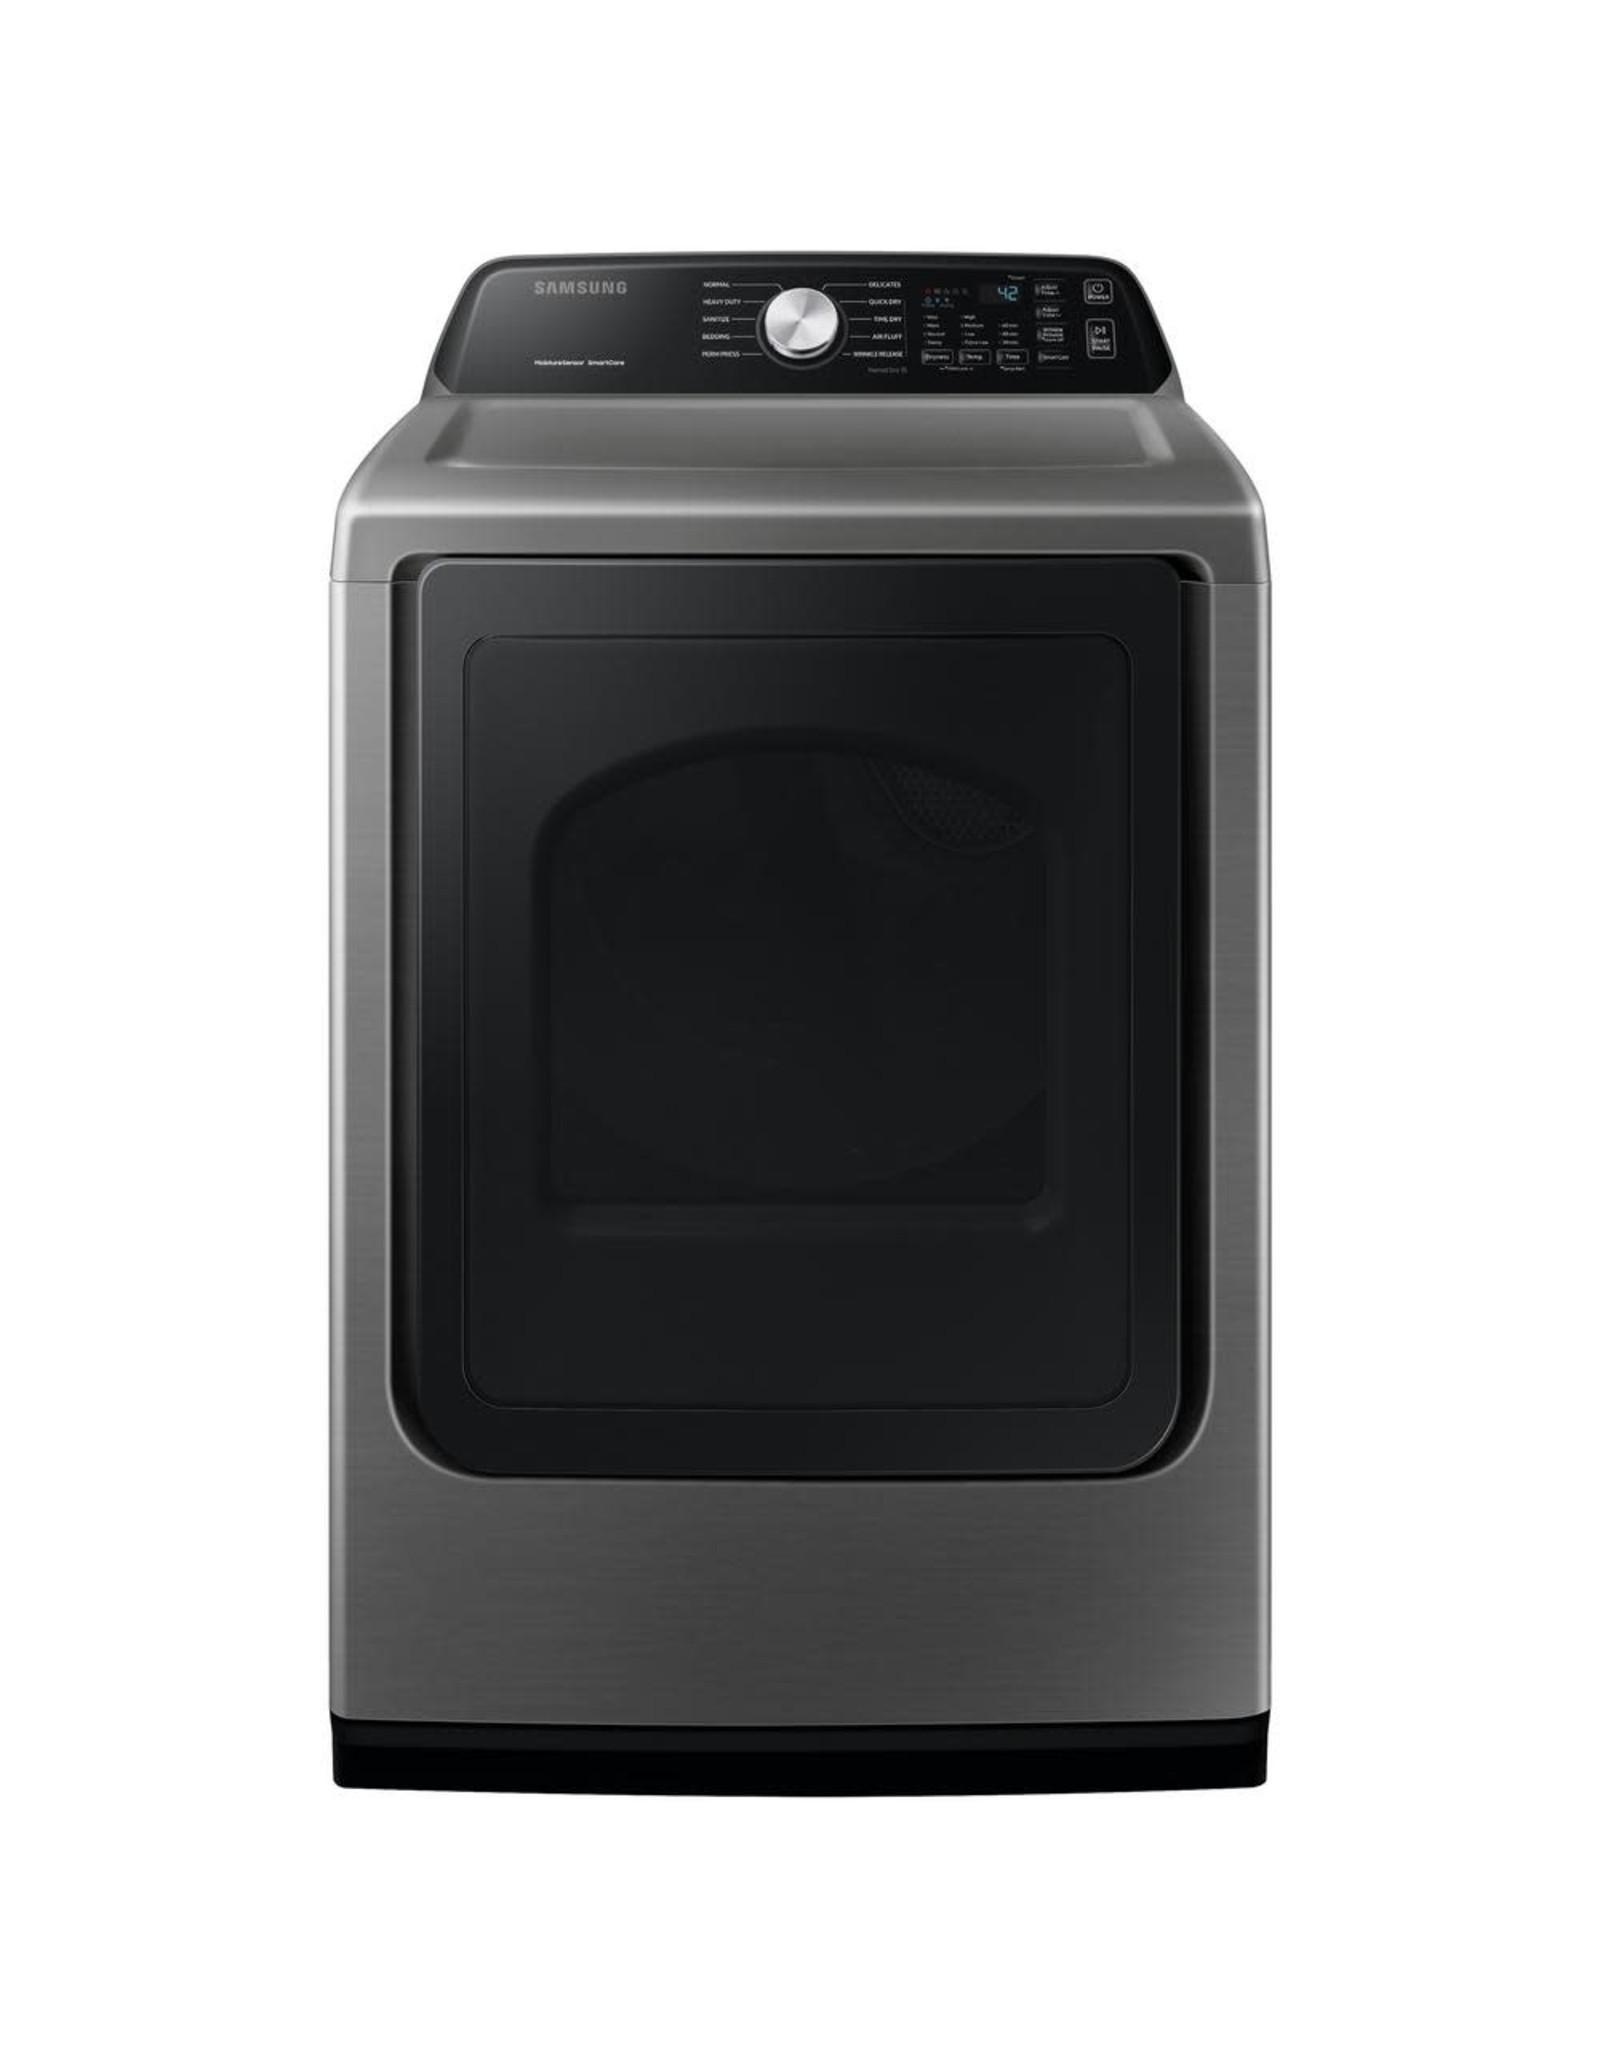 SAMSUNG DVE45T3400P Large 7.4 cu. ft. Capacity Platinum Top Load Electric Dryer with Sensor Dry